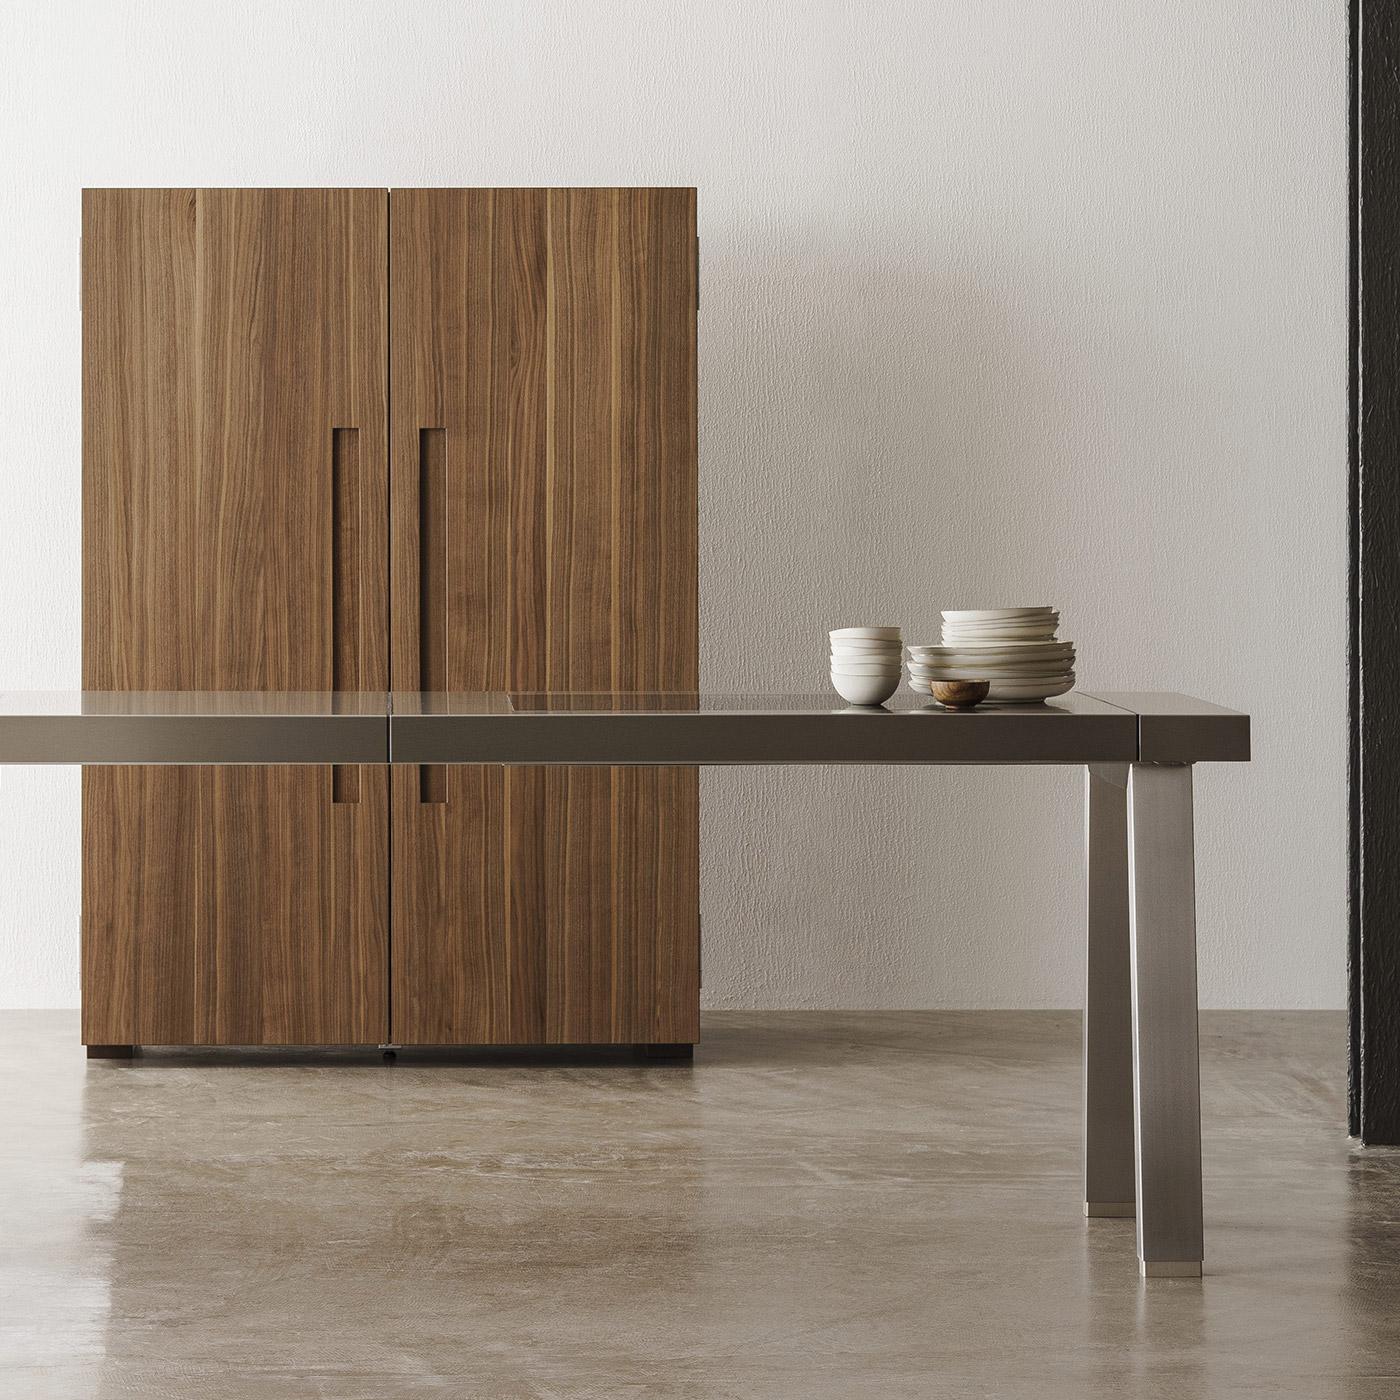 minimal b2 kitchen workshop by Bulthaup